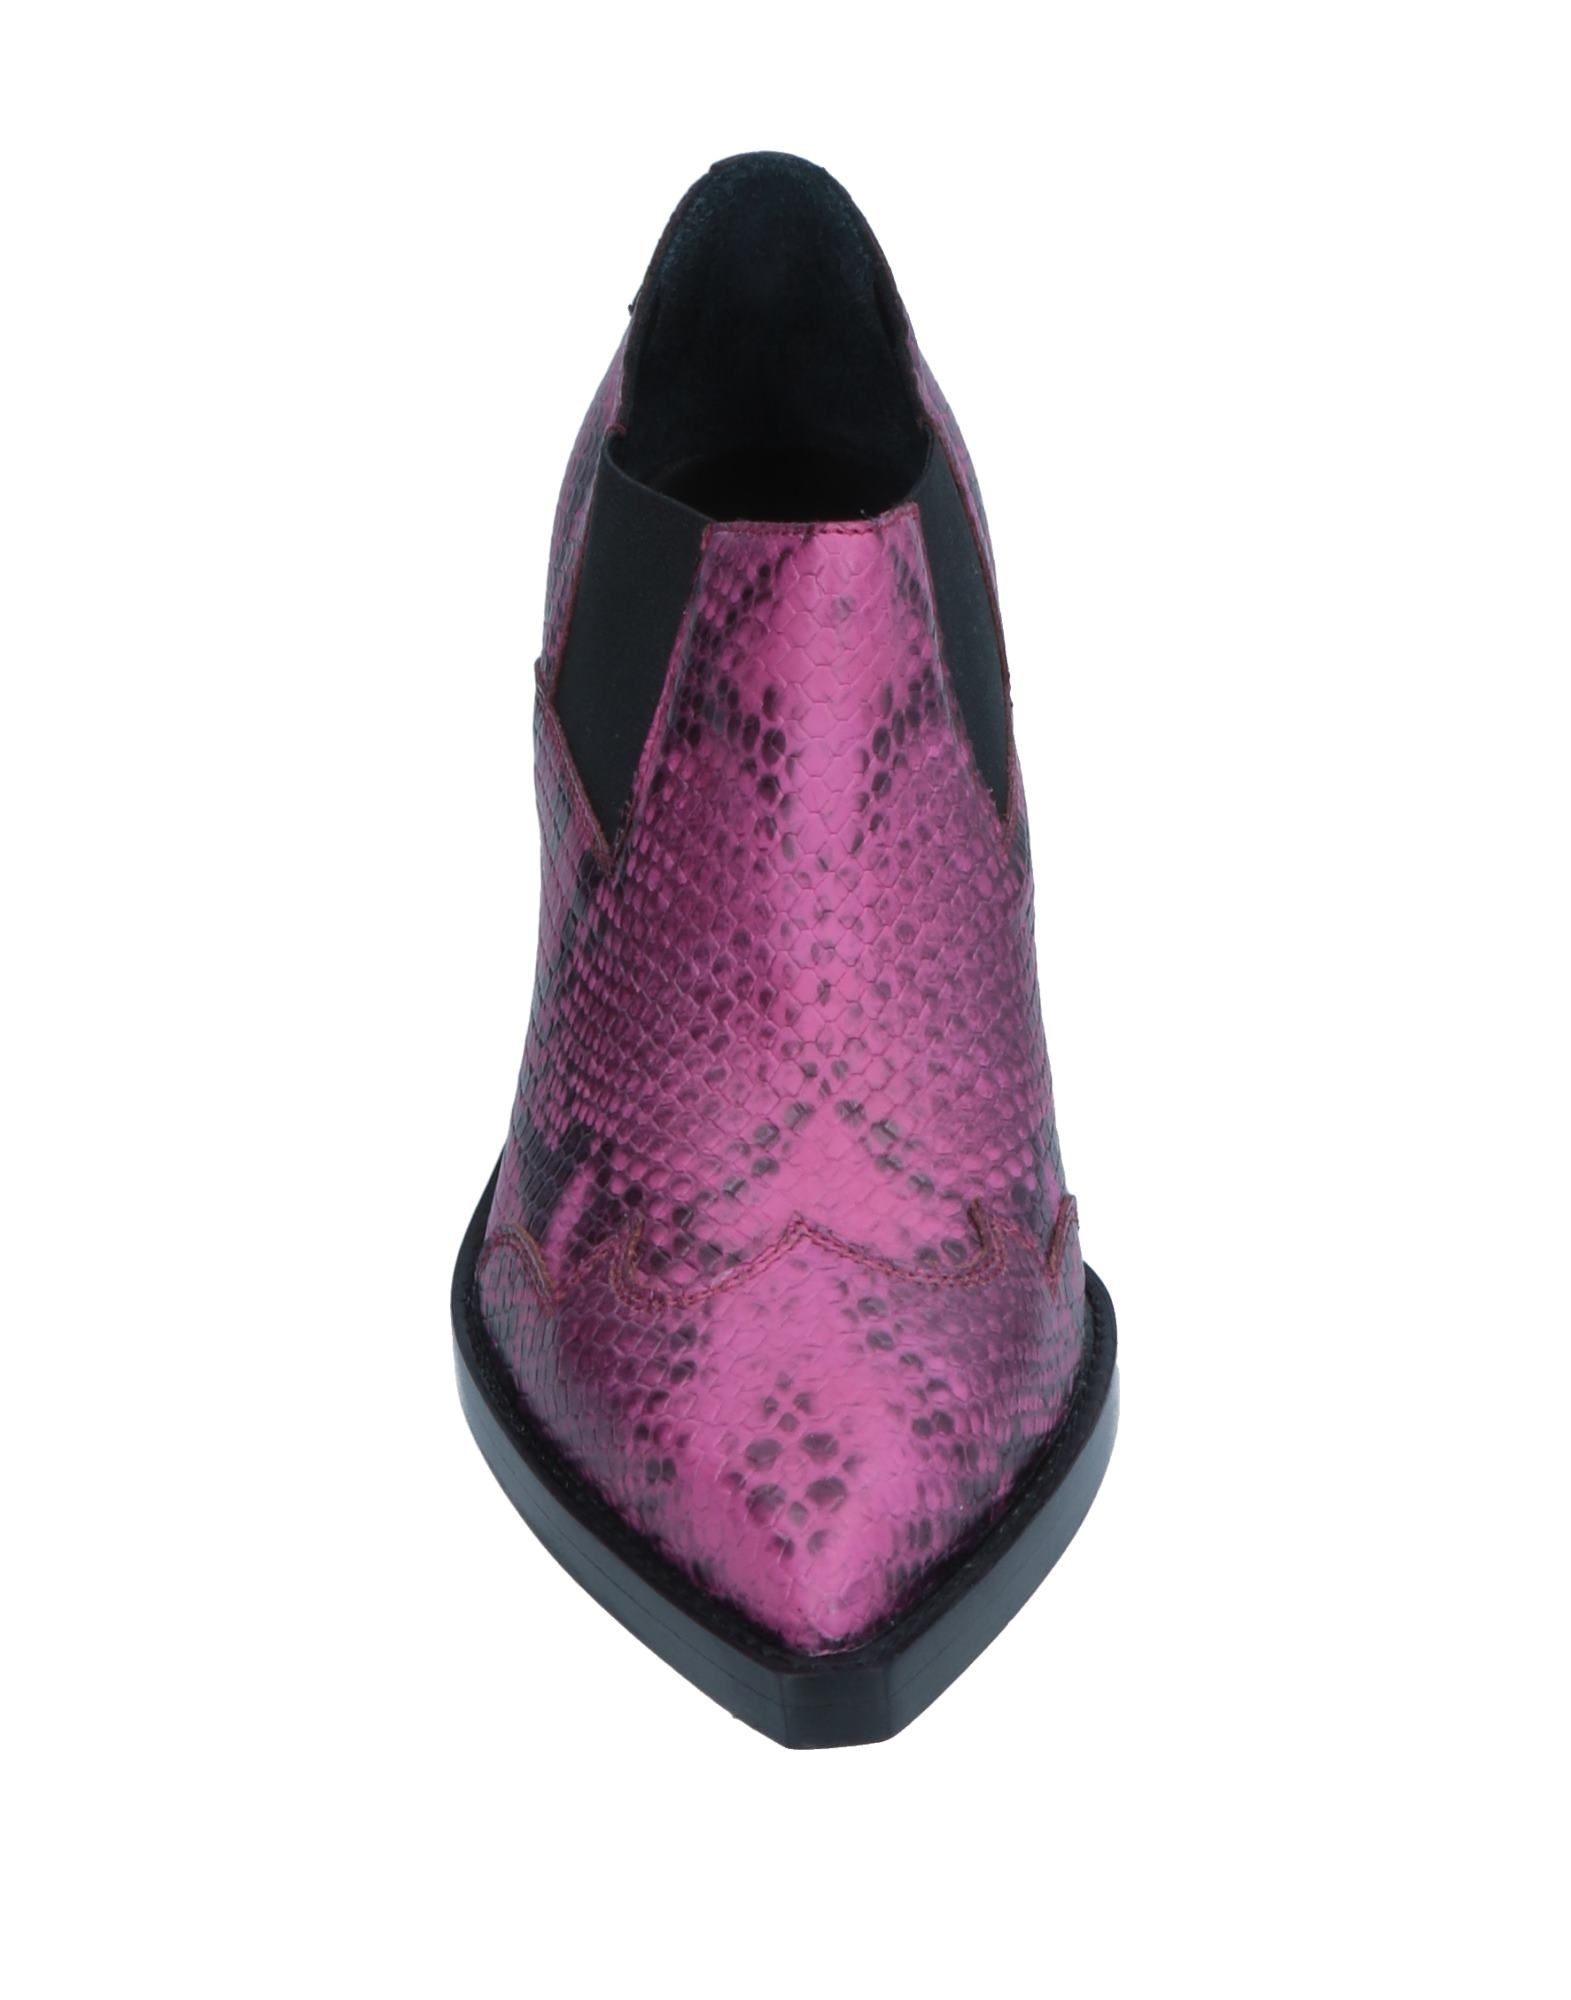 Mm6 Maison Margiela gut Stiefelette Damen  11544274QHGünstige gut Margiela aussehende Schuhe 59d5fe